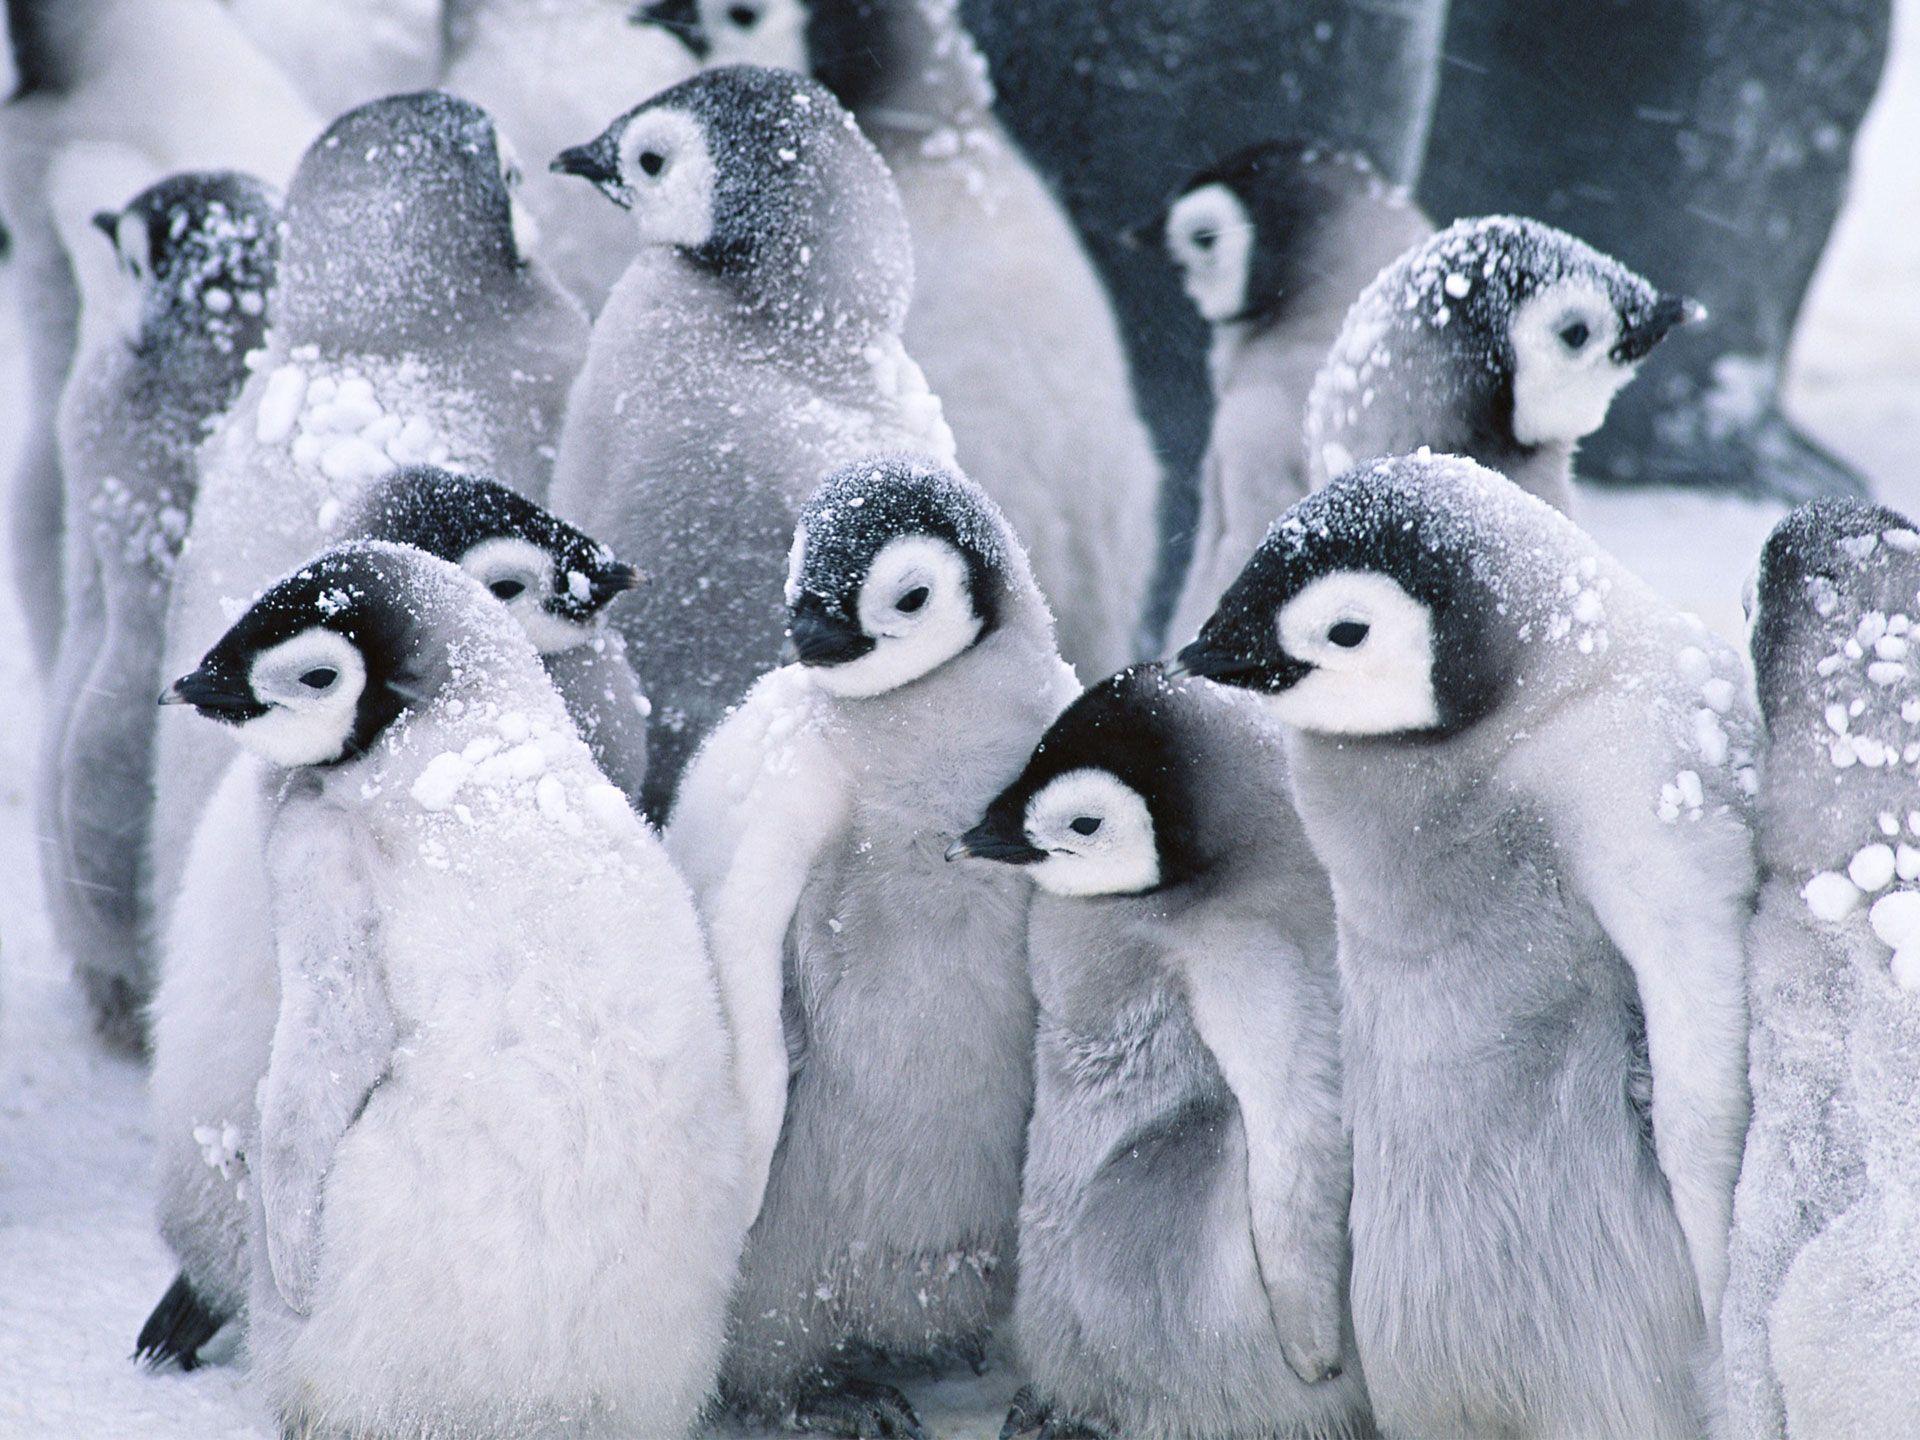 Cute Arctic Penguins Wallpaper - http://www.56pic.com/animals ...